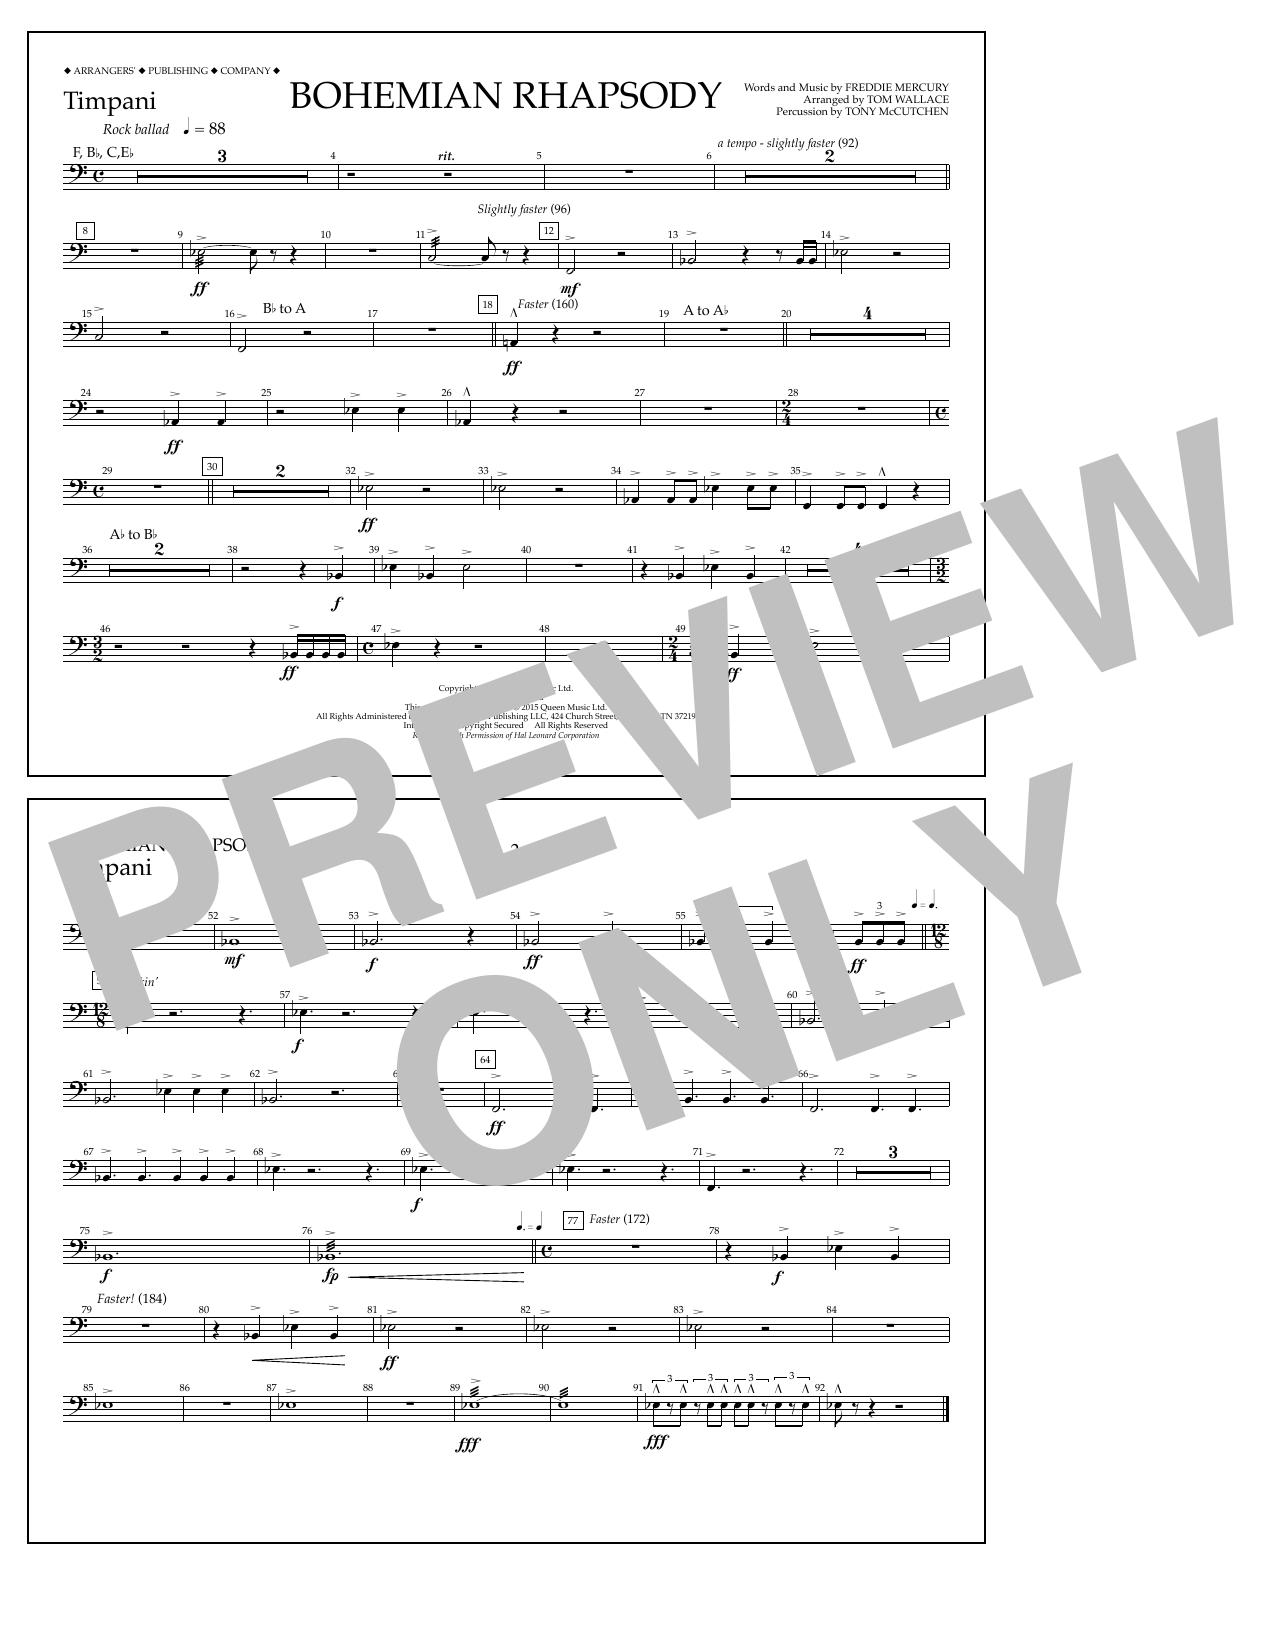 Bohemian Rhapsody - Timpani Sheet Music